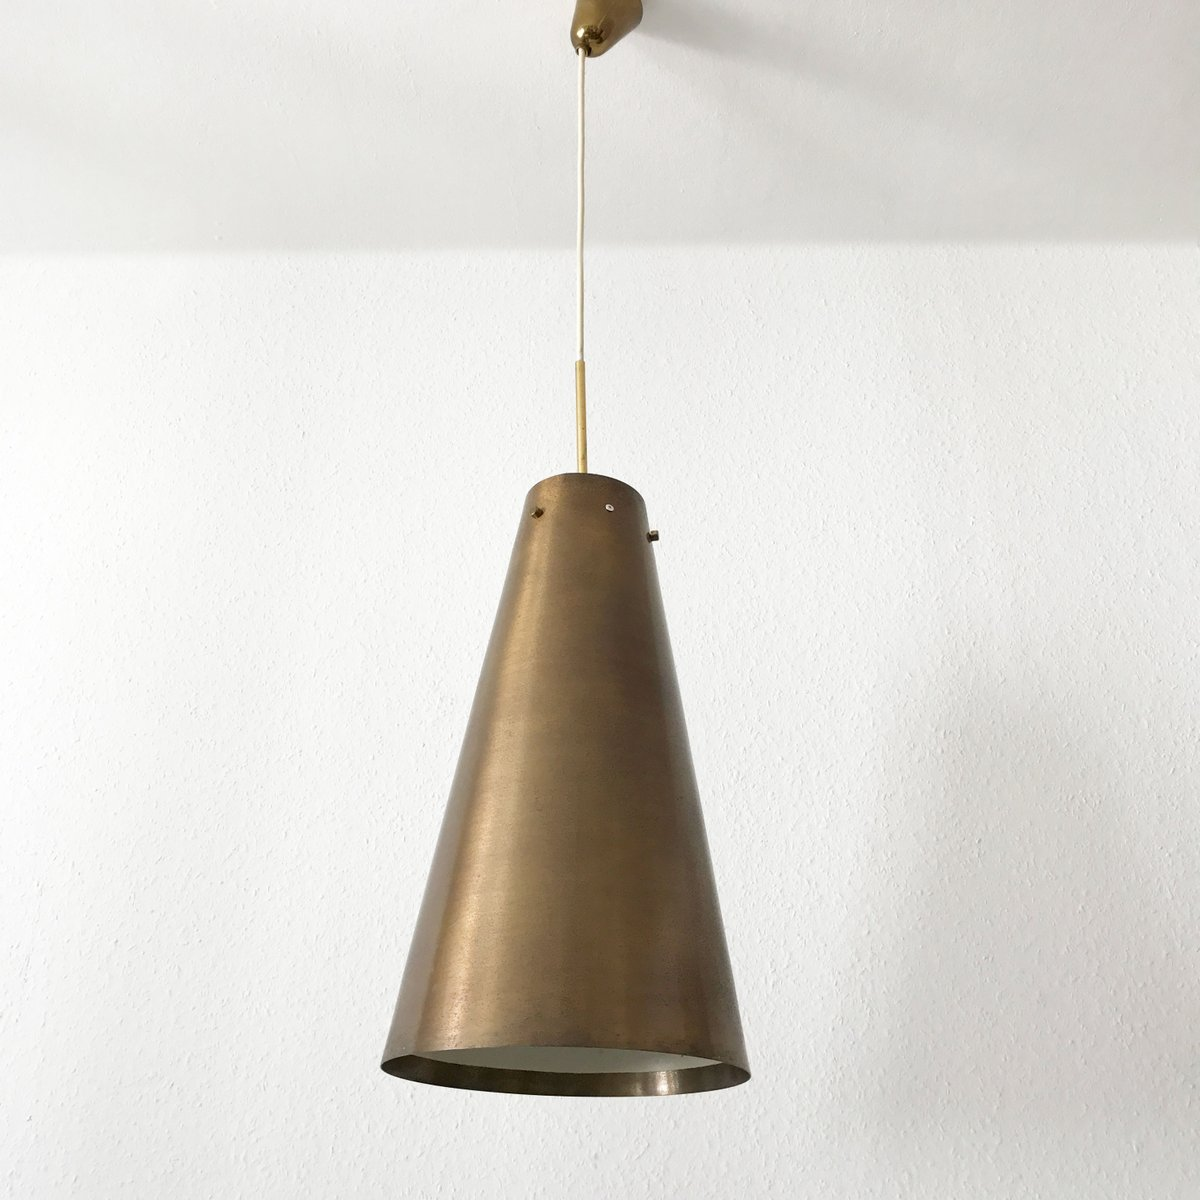 mid century pendant lighting. Large Mid-Century Modern Brass Pendant Lamp, 1950s Mid Century Lighting M